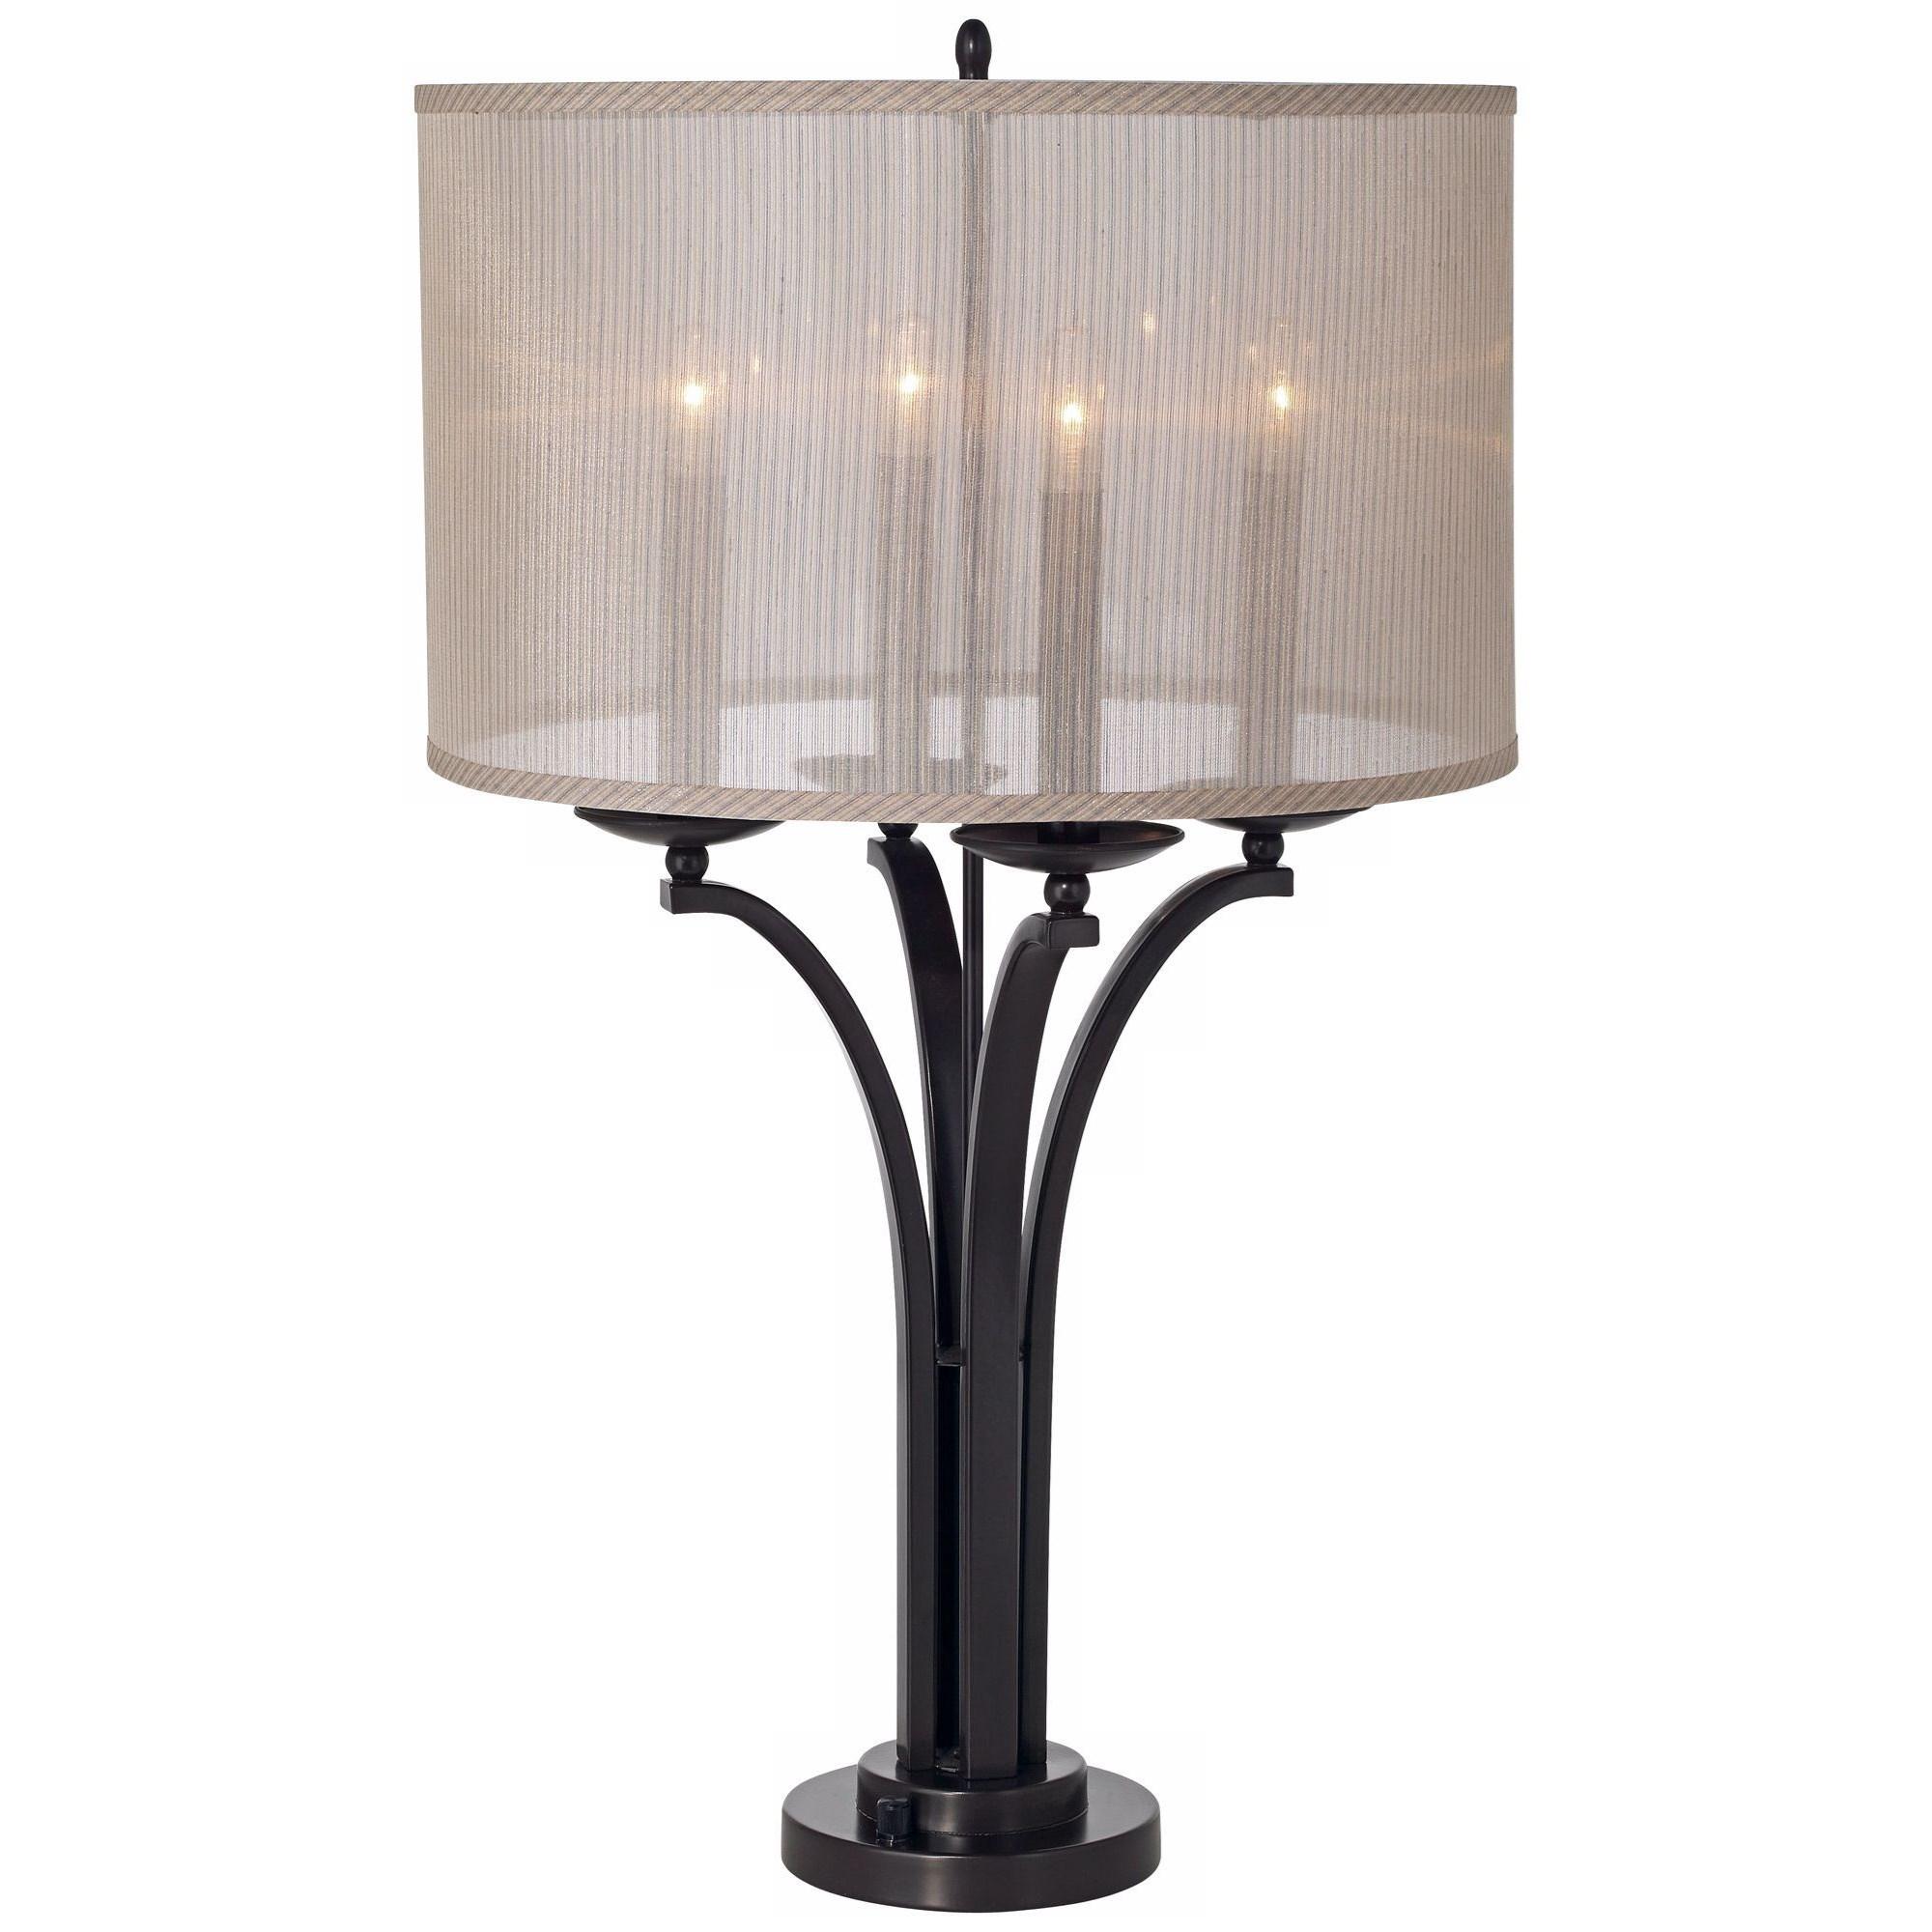 Pacific Coast Lighting Table Lamps Kig Pennsylvania